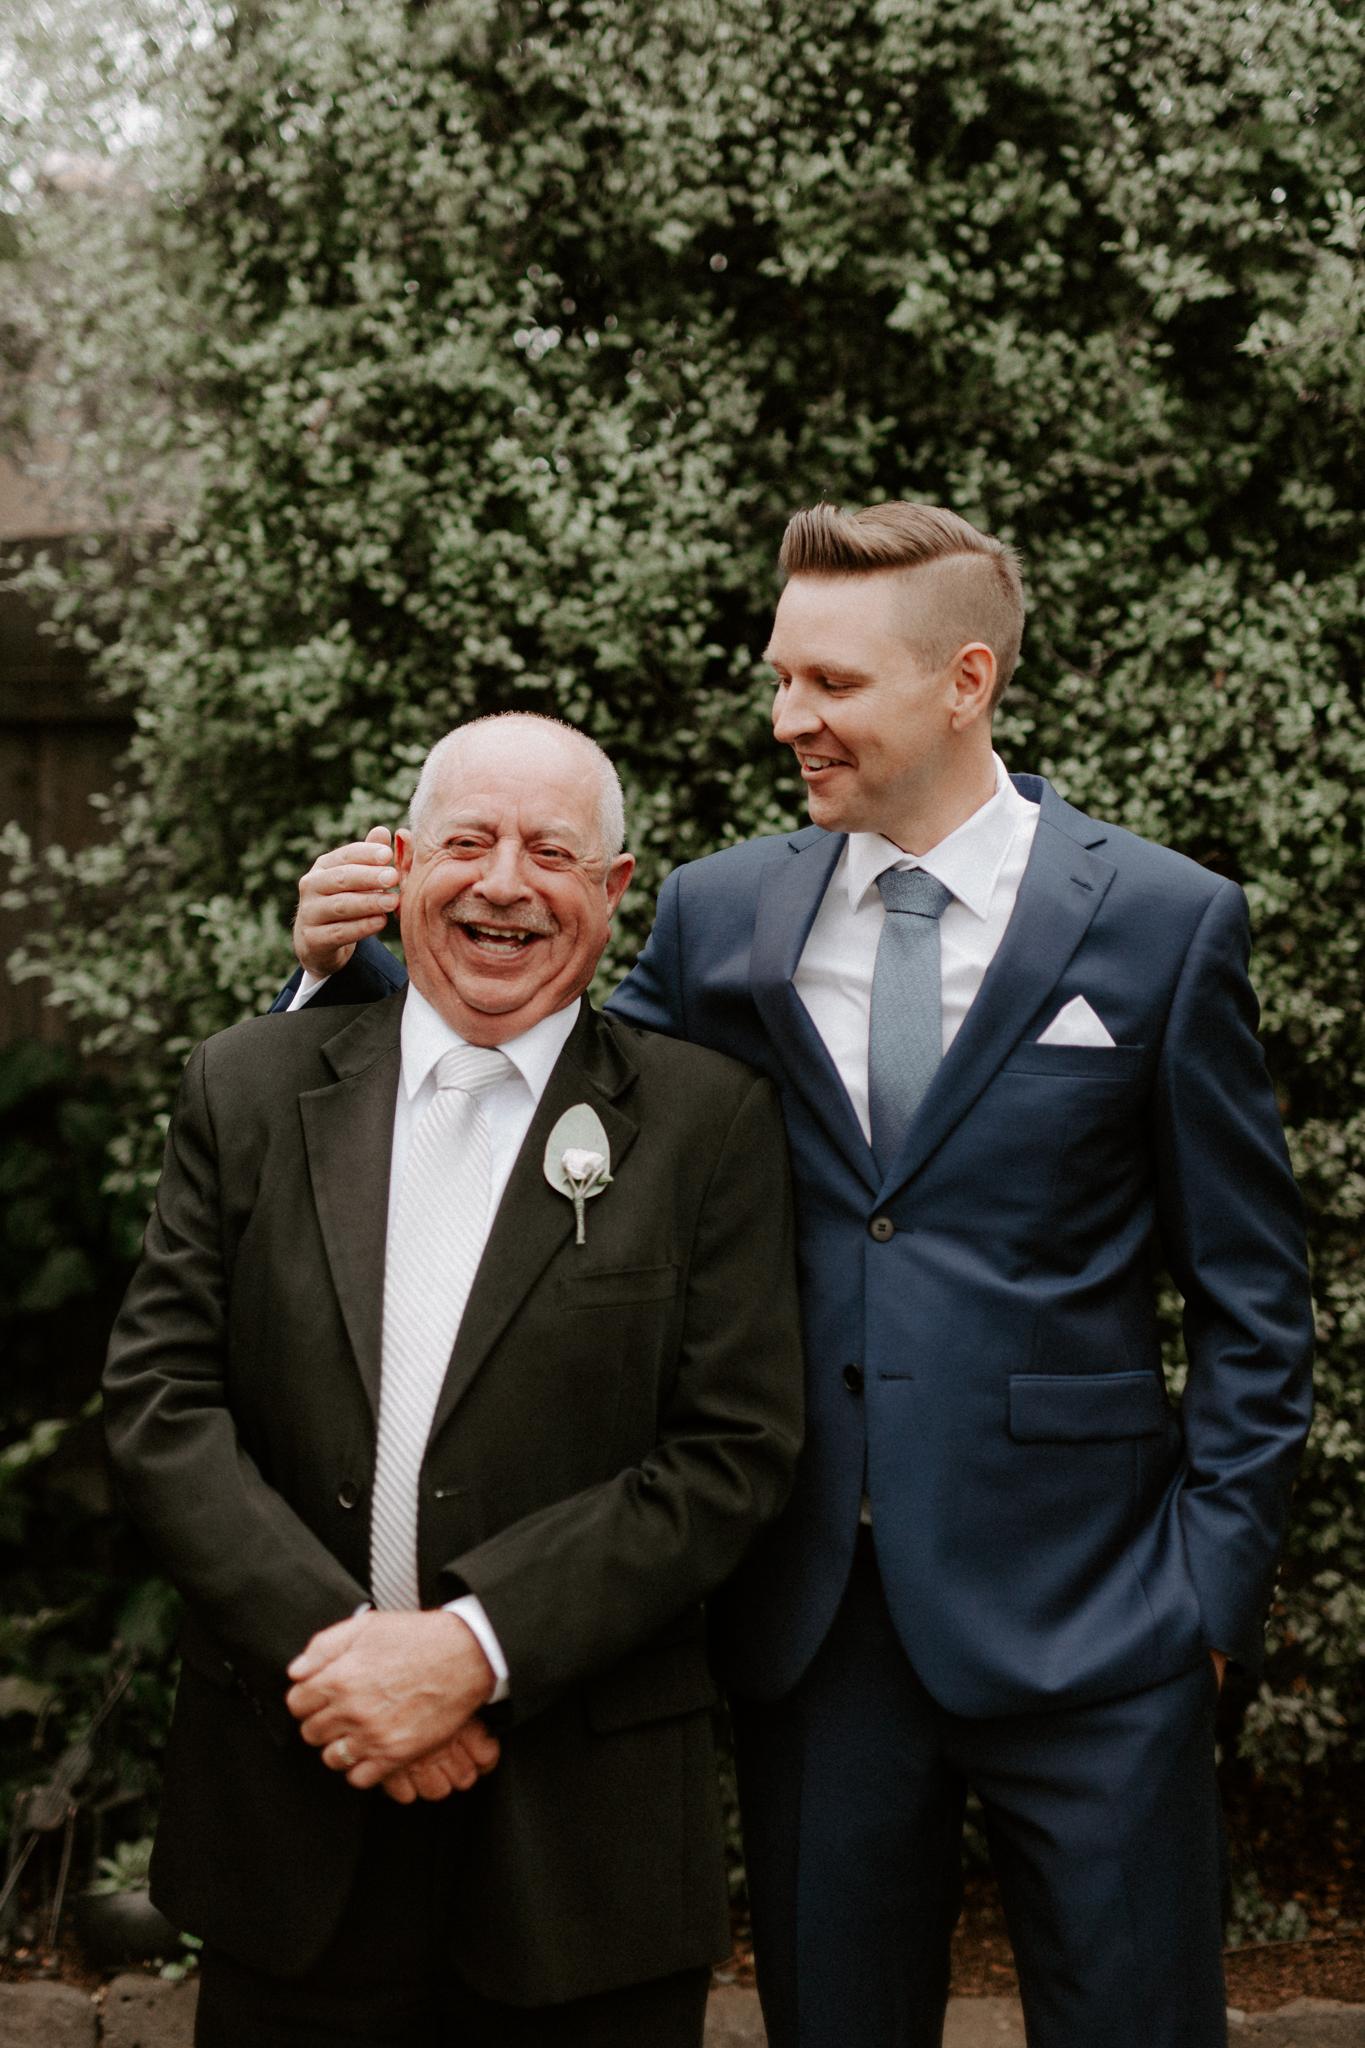 St-Kilda-Garden-Wedding-Emotions-and-Math-Photograph-018.jpg